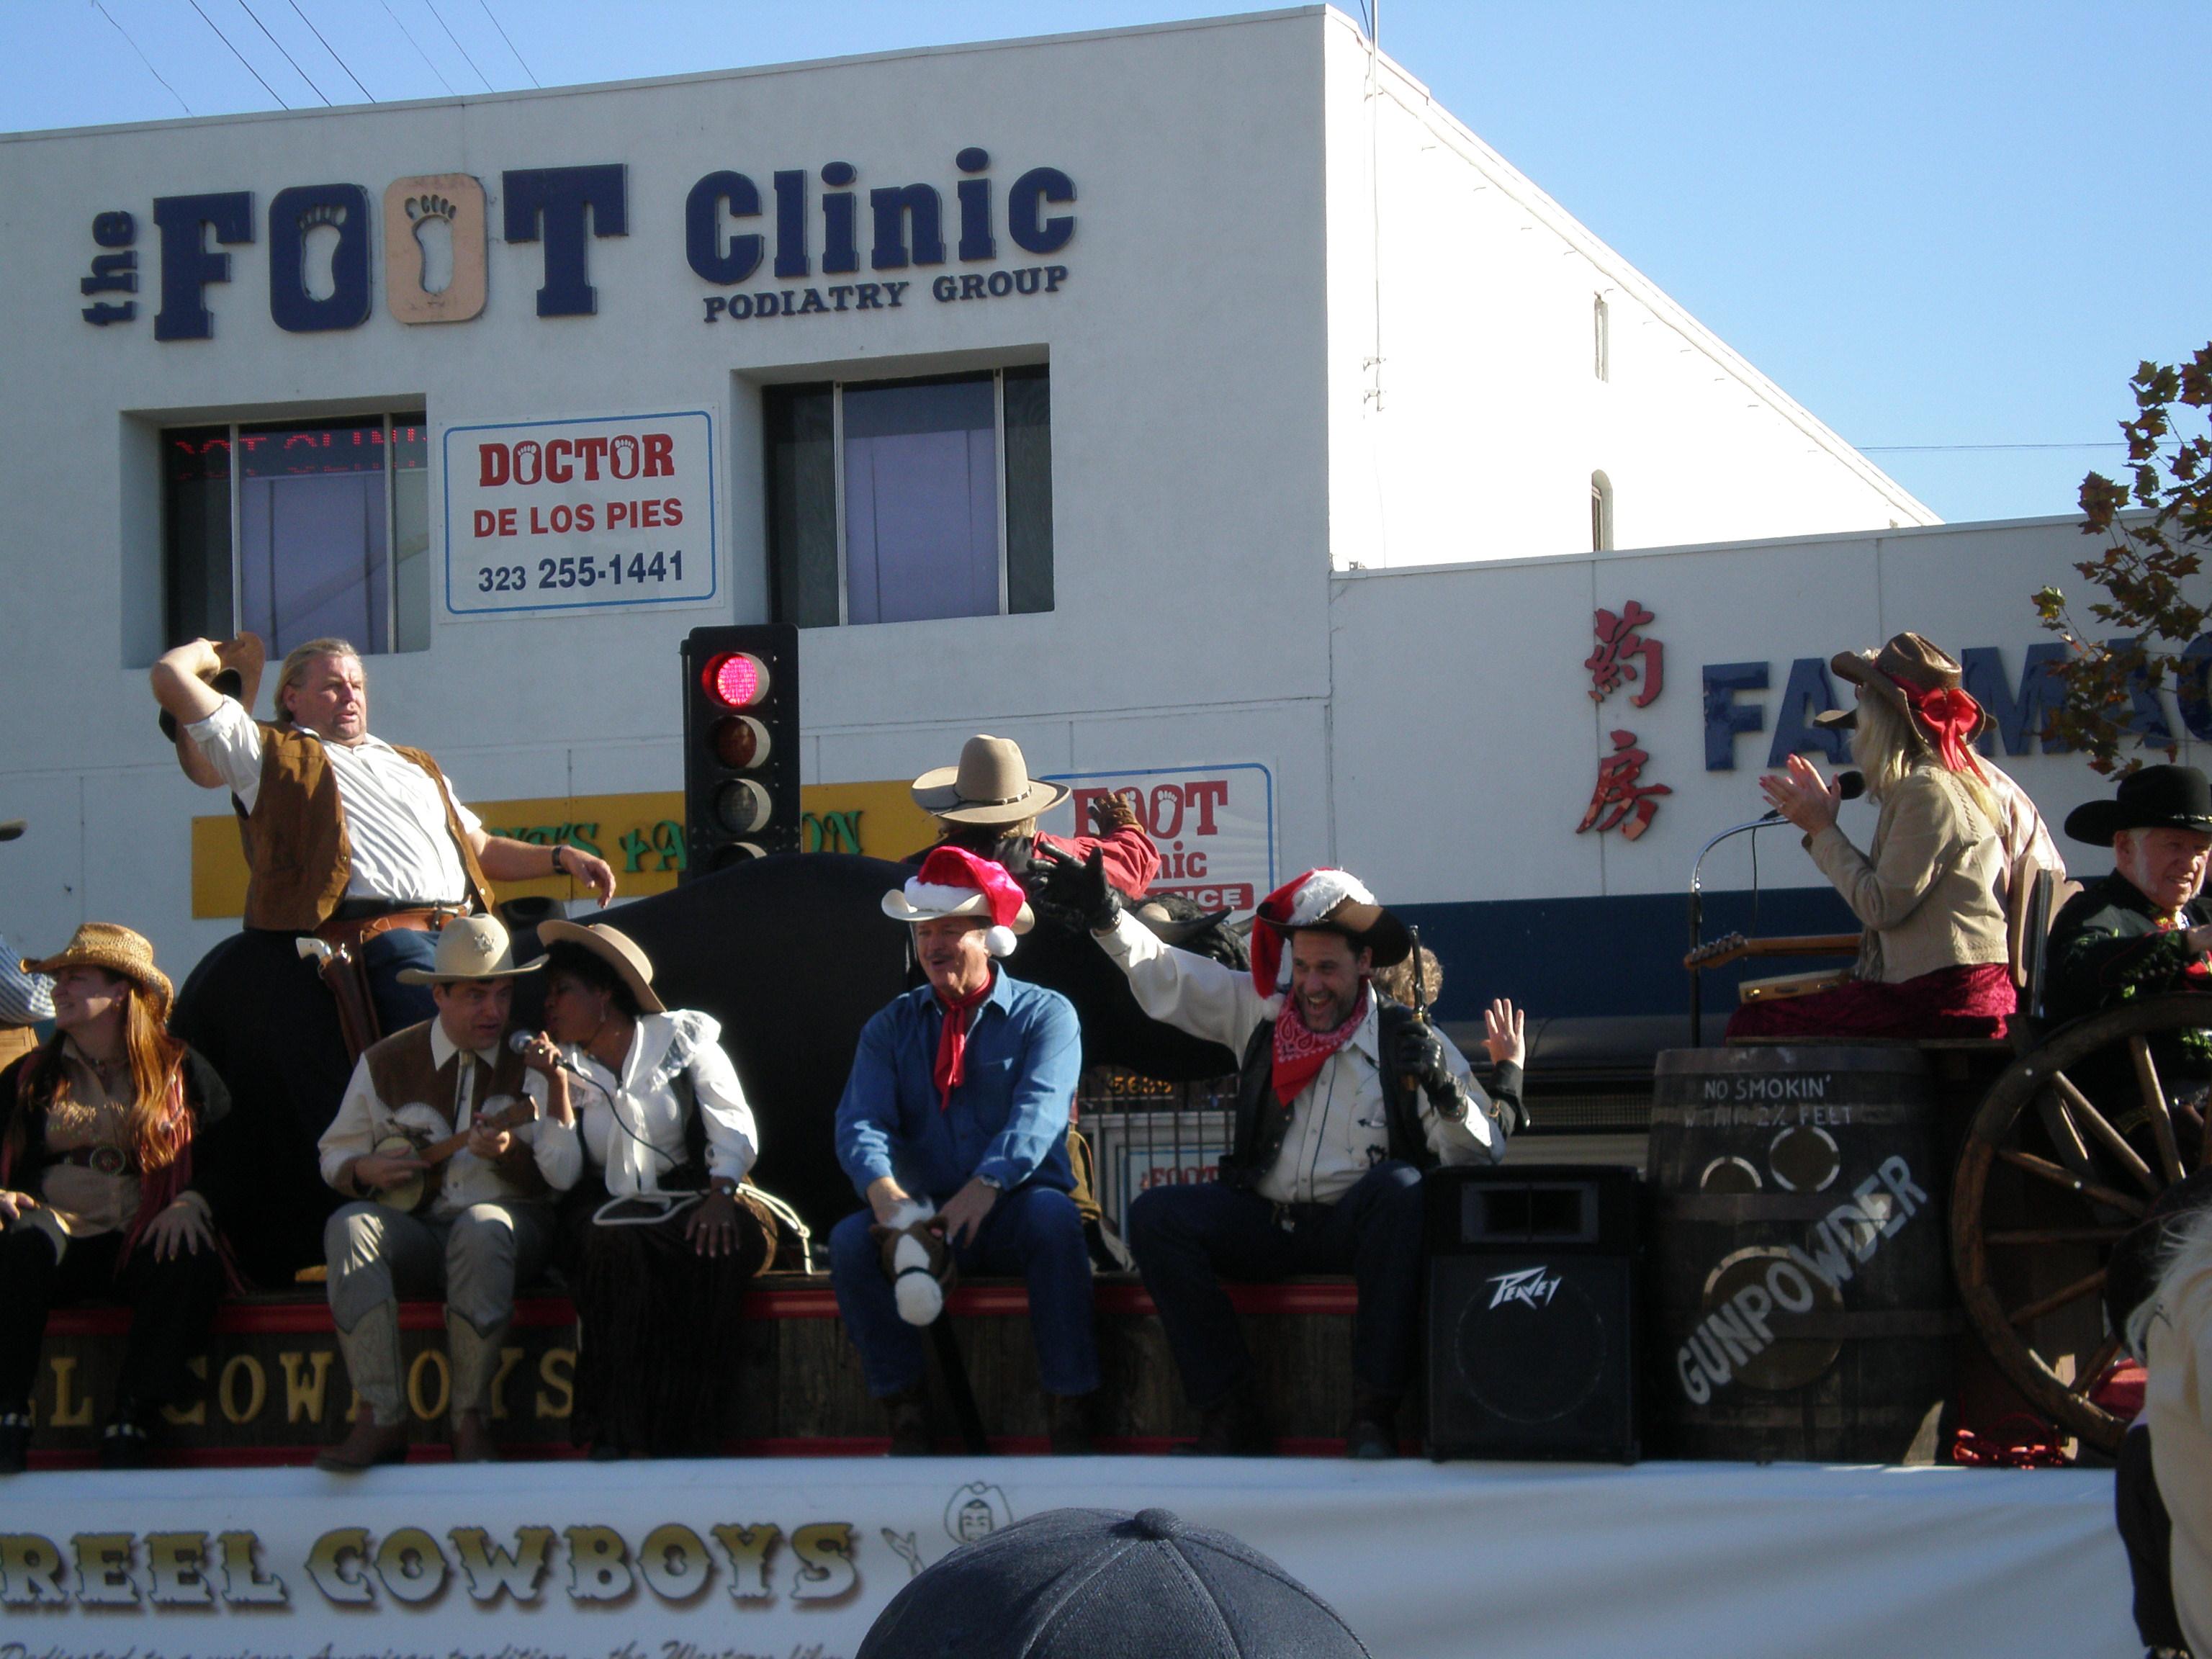 Reel Cowboys